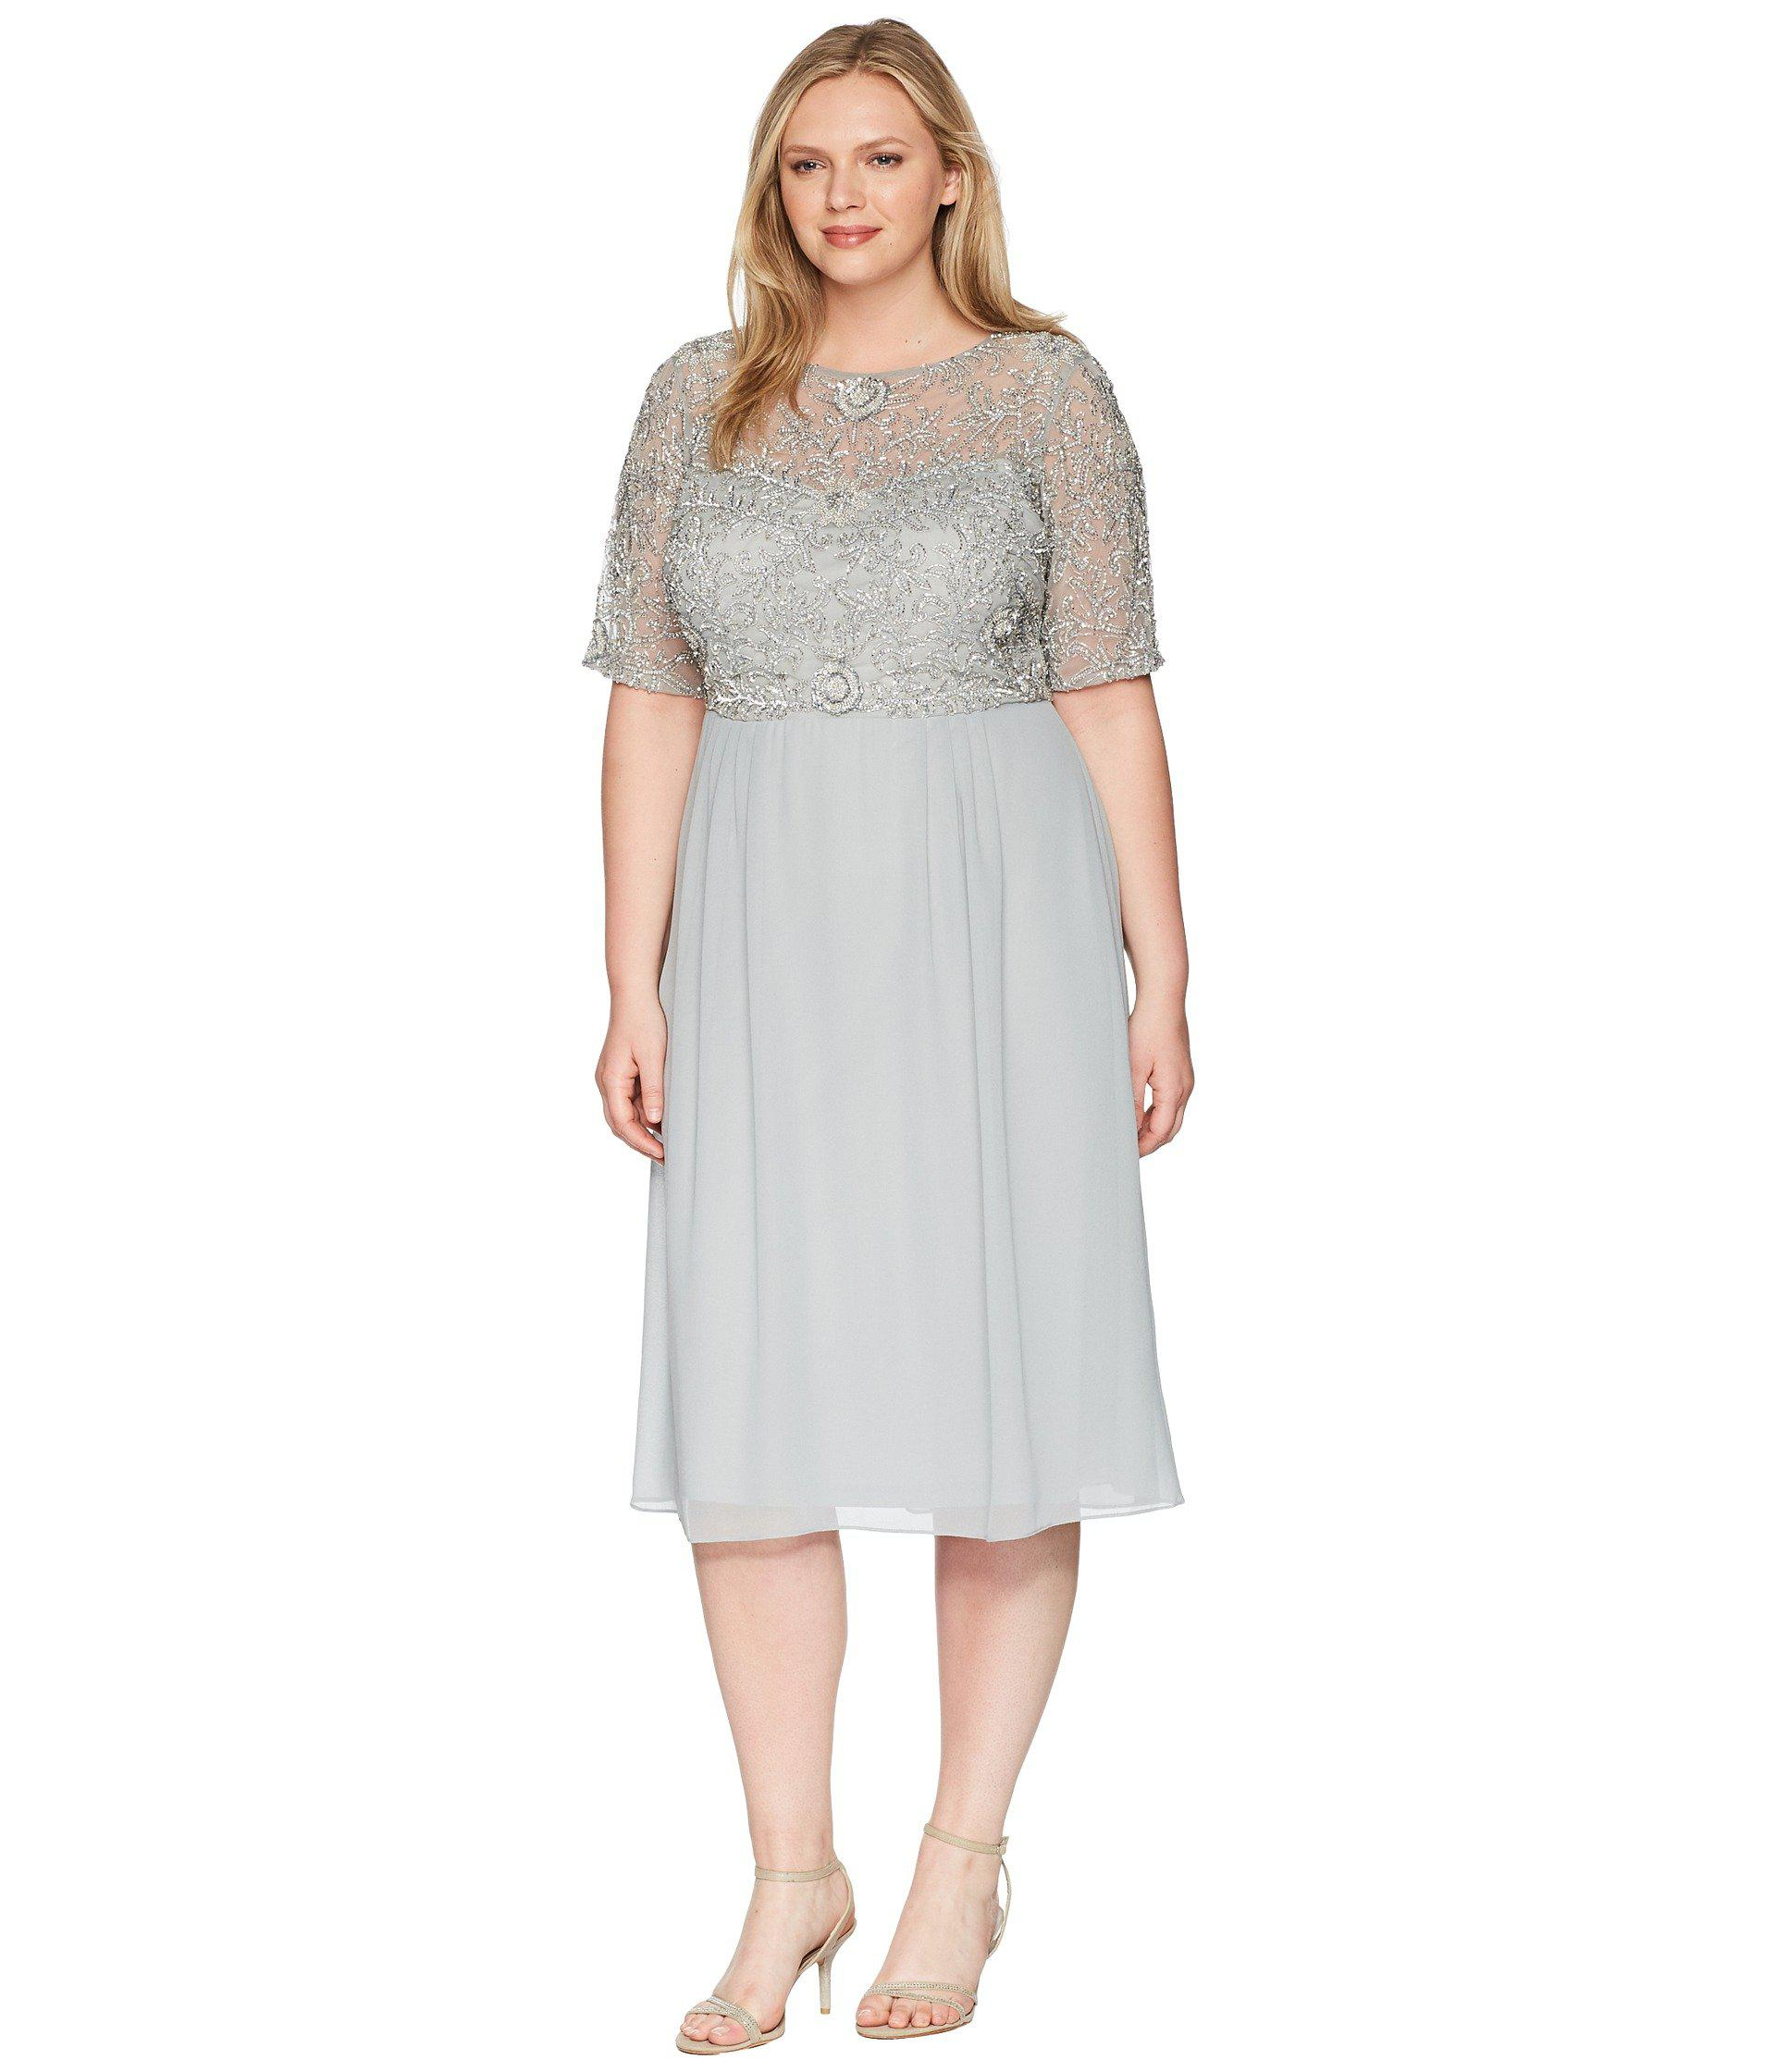 9b816de4d2d Lyst - Adrianna Papell Plus Size Beaded Dress - Save 25.480769230769226%